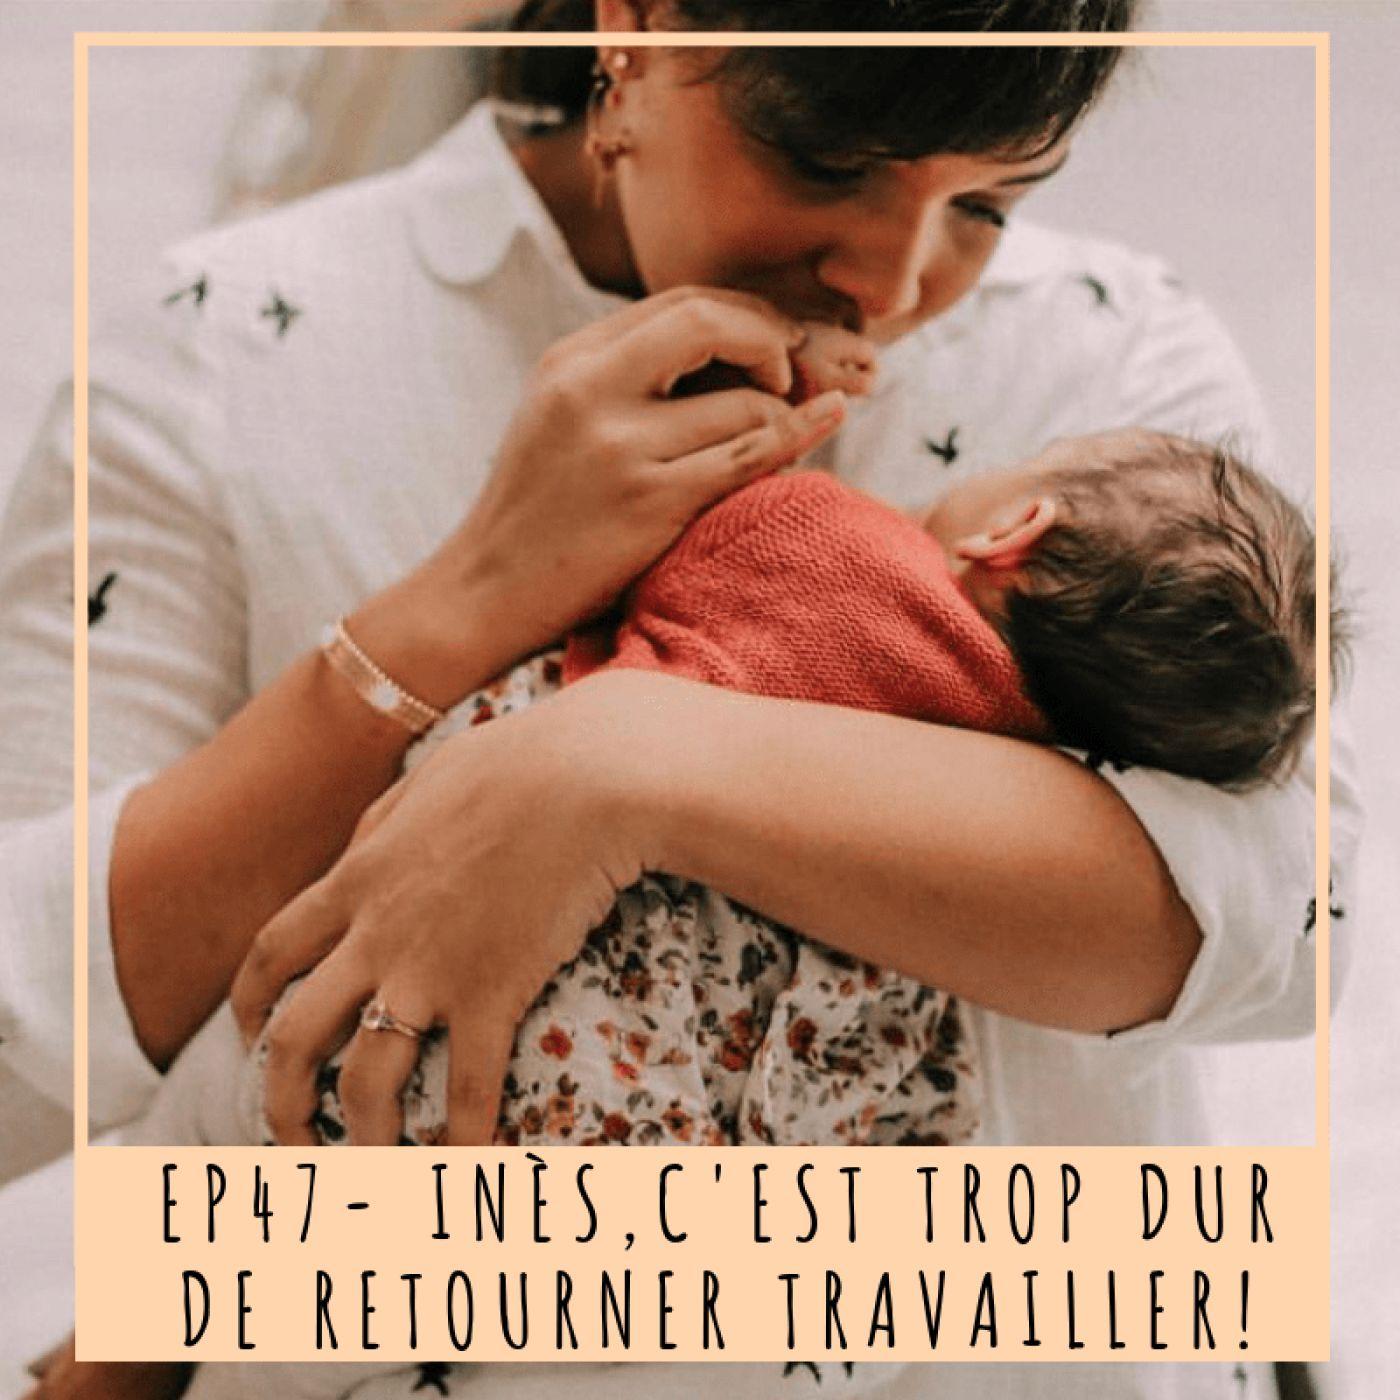 EP47- INES, C'EST TROP DUR DE RETOURNER TRAVAILLER!